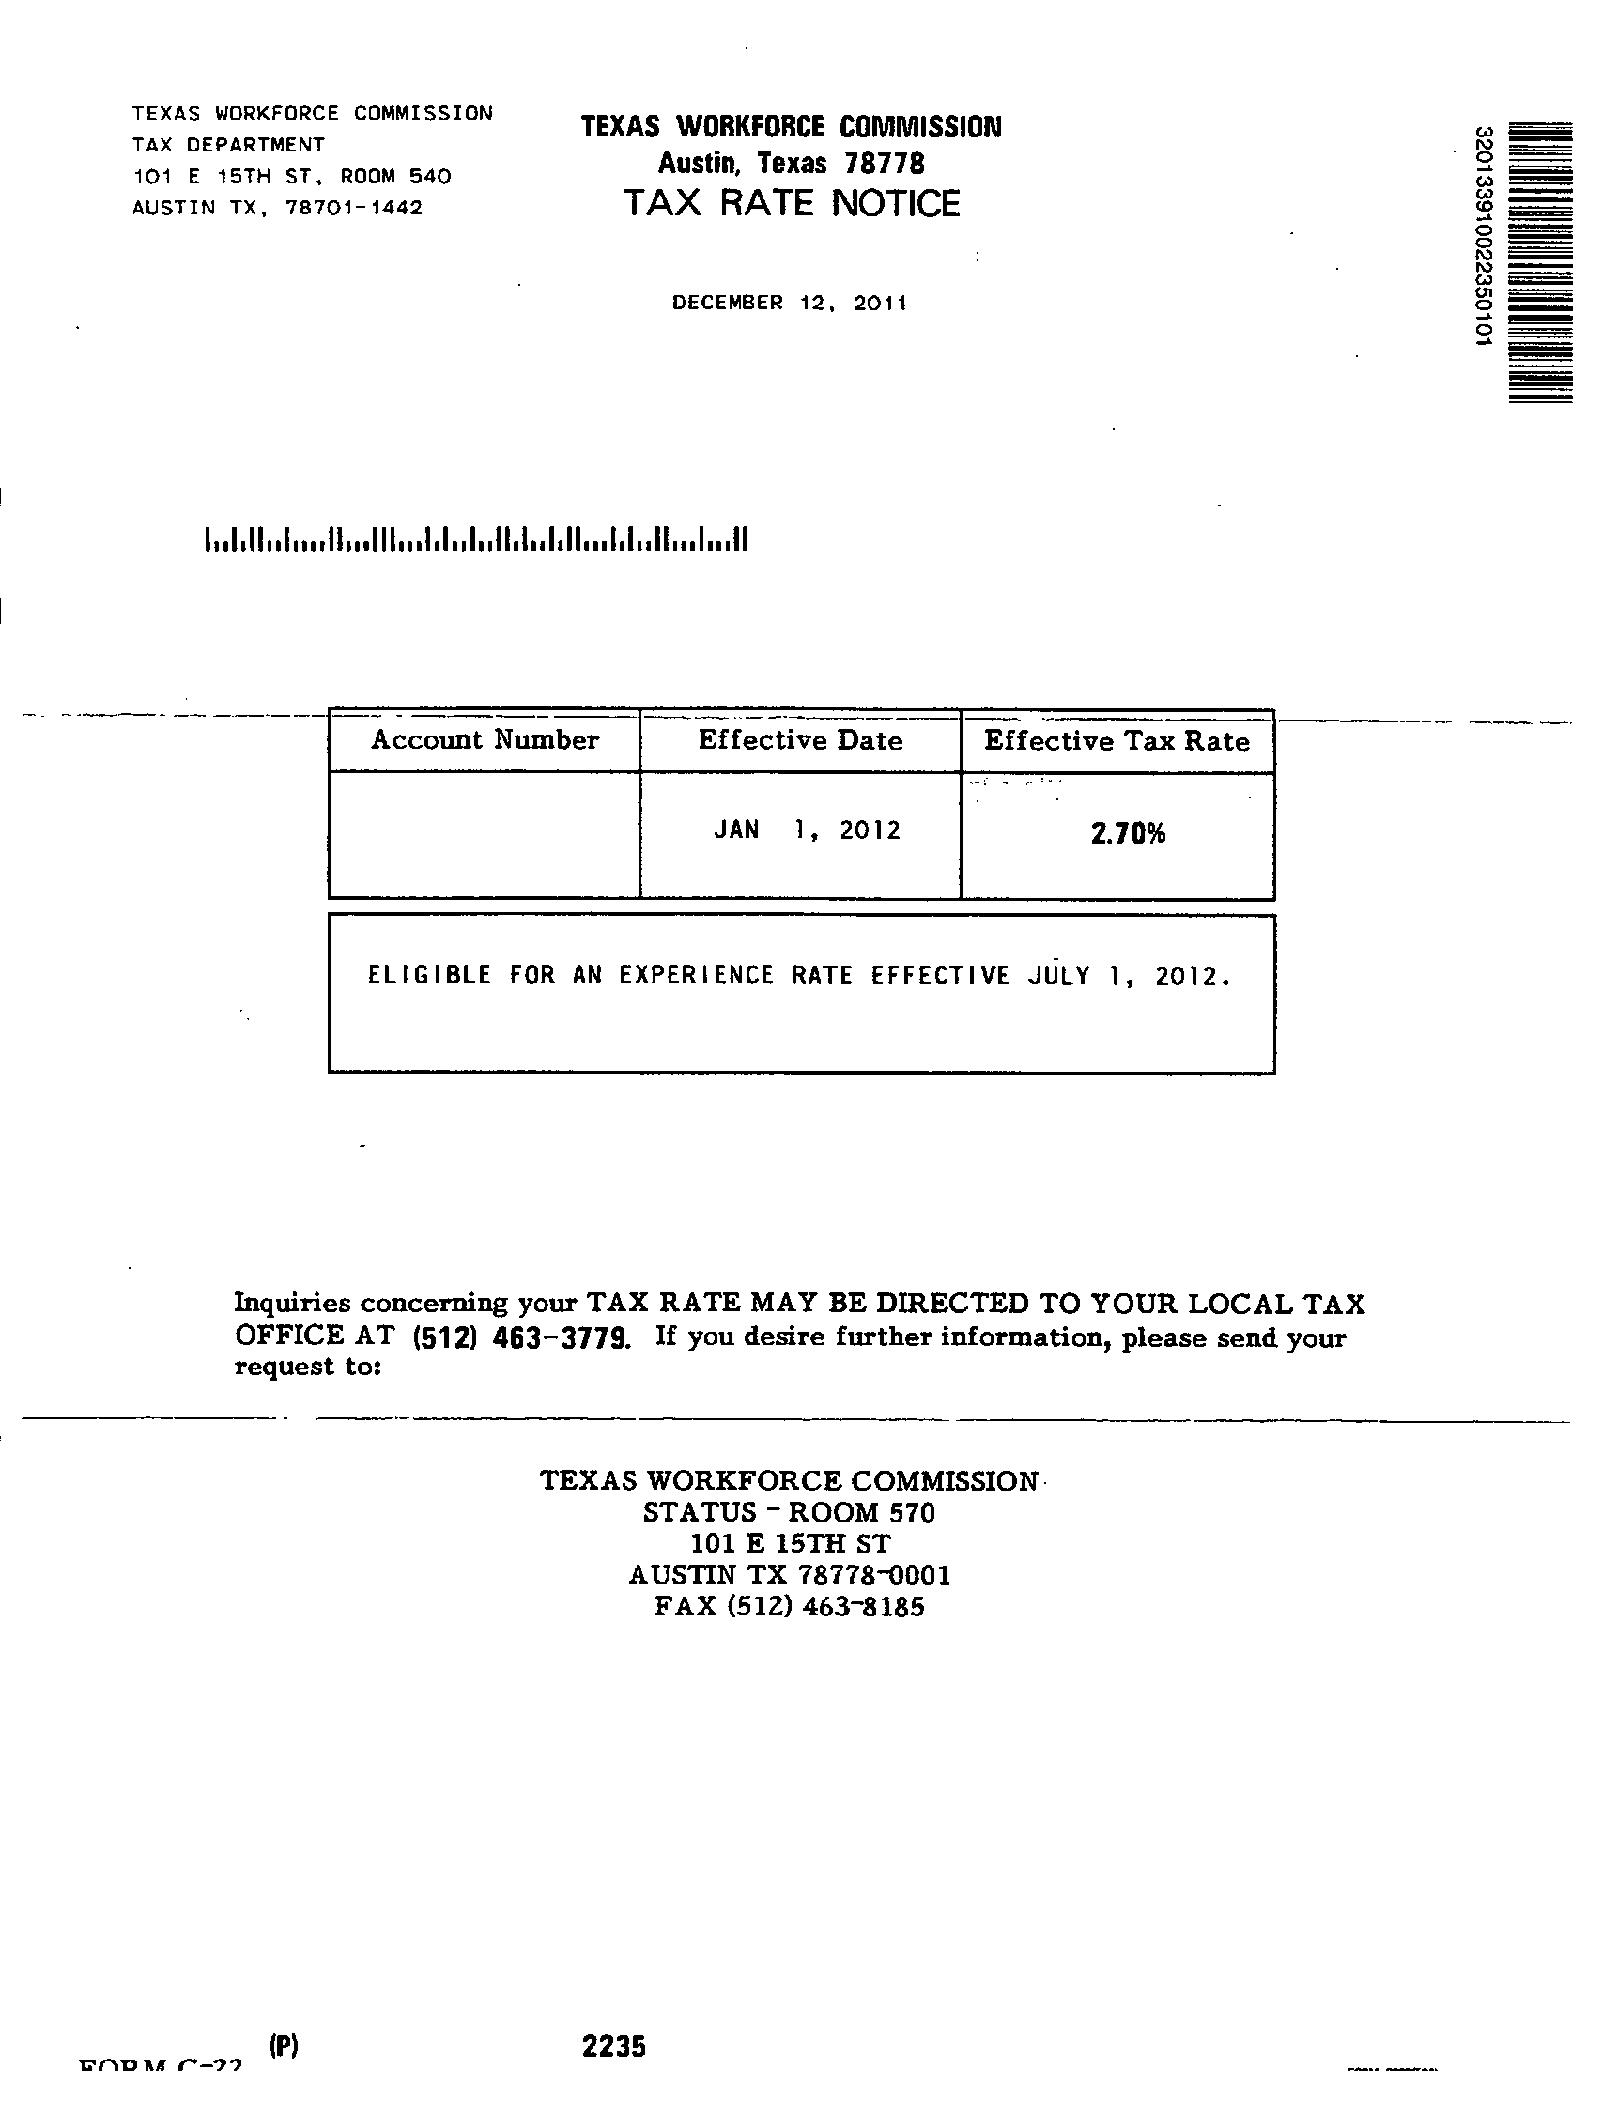 What is ri sui/sdi tax 2011